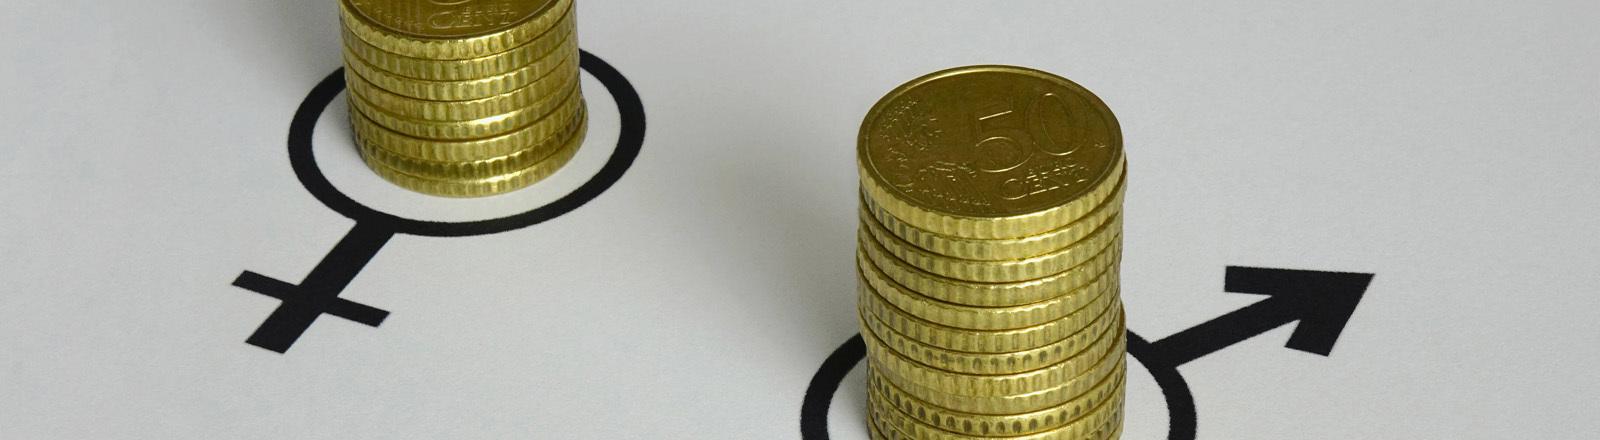 Symbolbild Gender Pay Gap